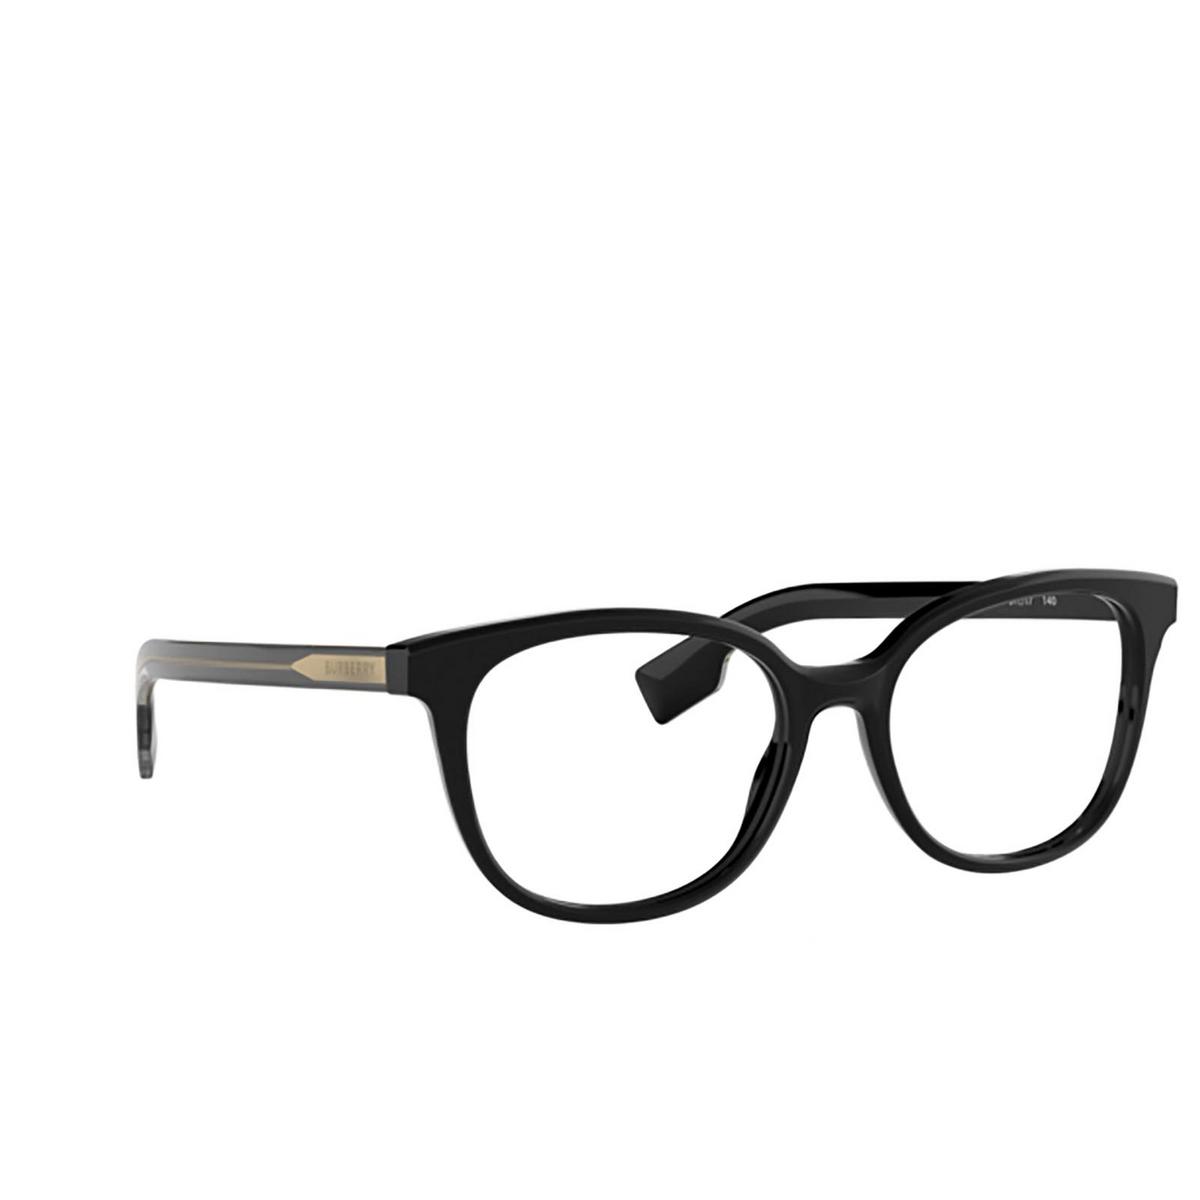 Burberry® Square Eyeglasses: BE2291 color Black 3758 - three-quarters view.